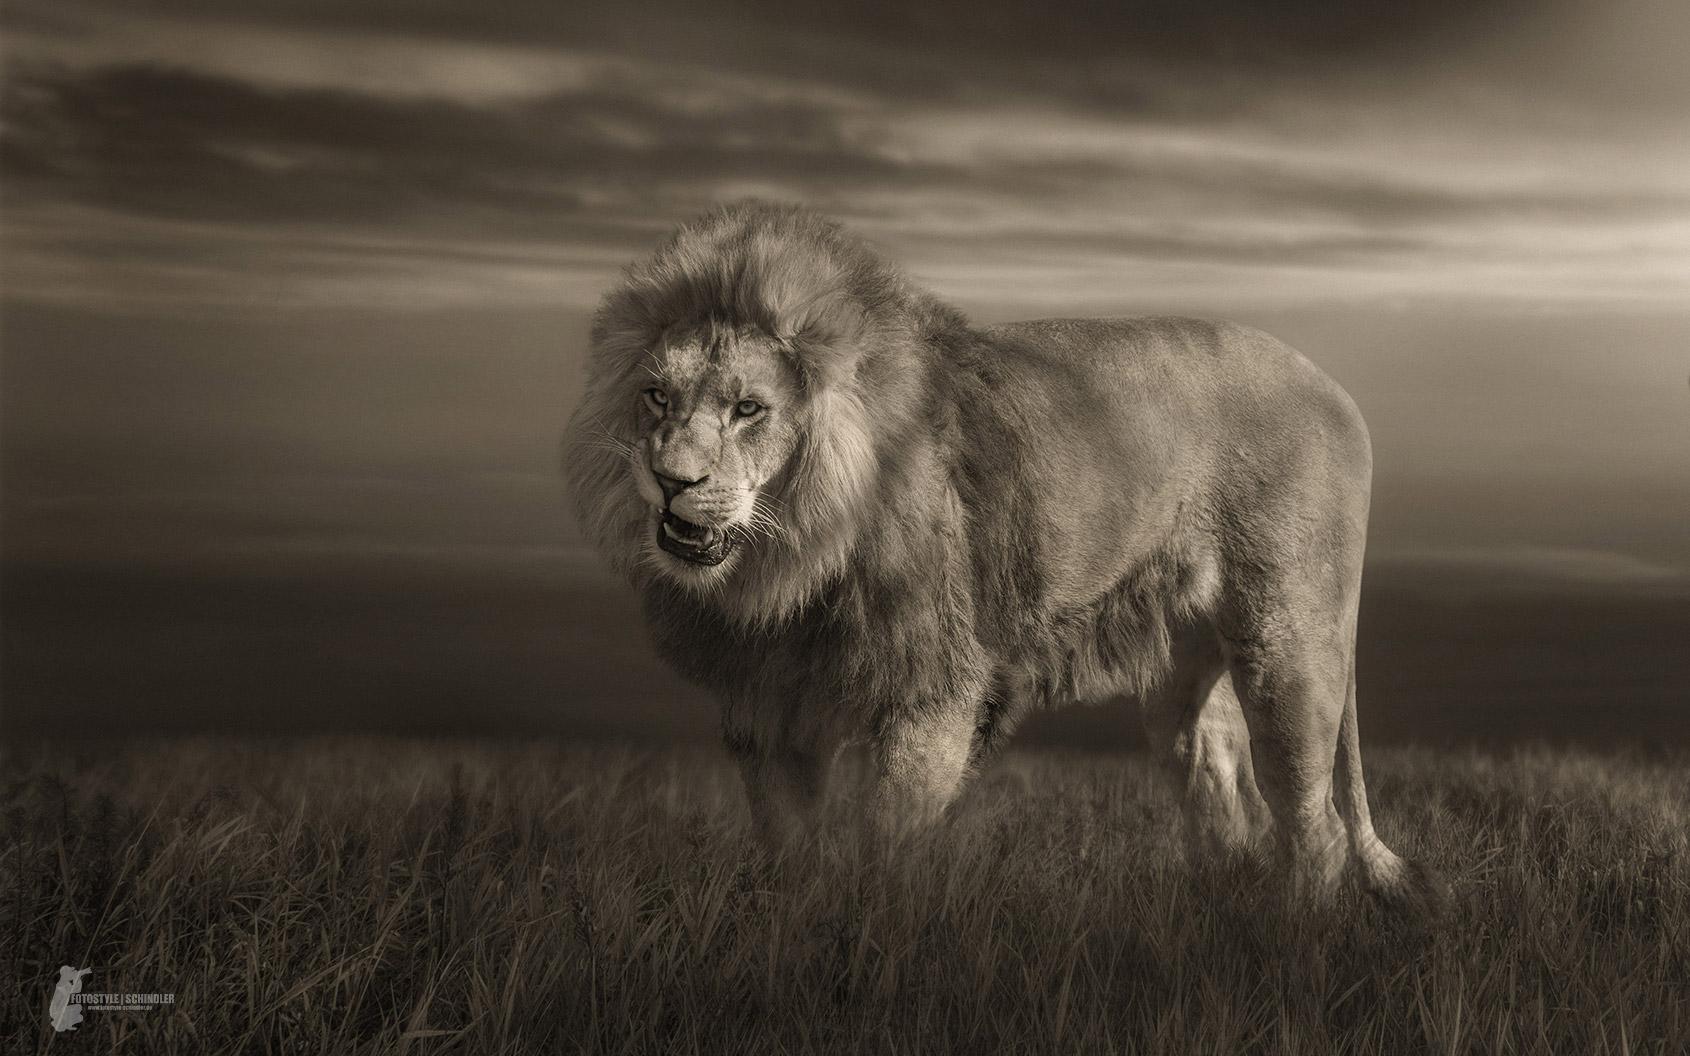 black lion video 1992 imdb - HD1690×1056